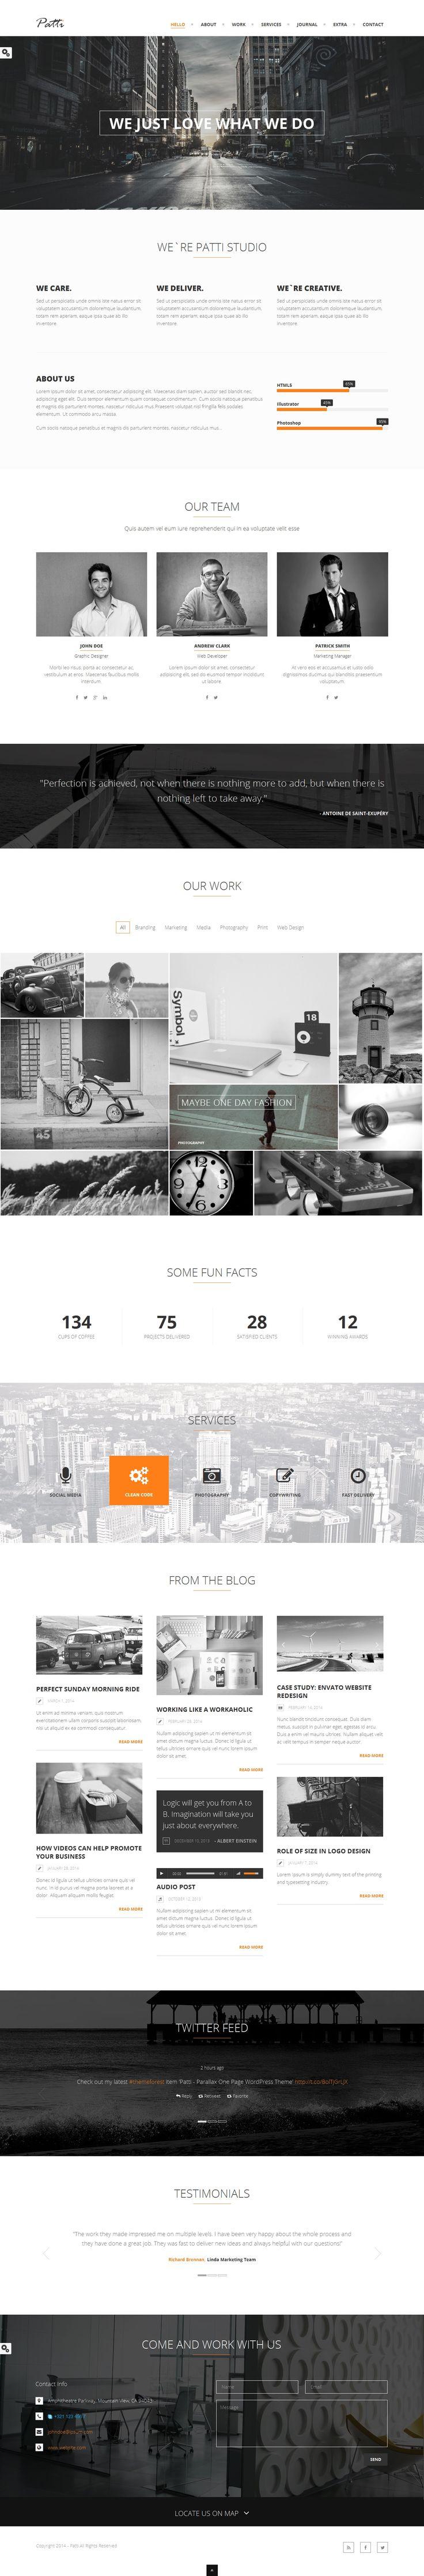 15 TOP Creative Premium WordPress Themes of 2014 #web #design